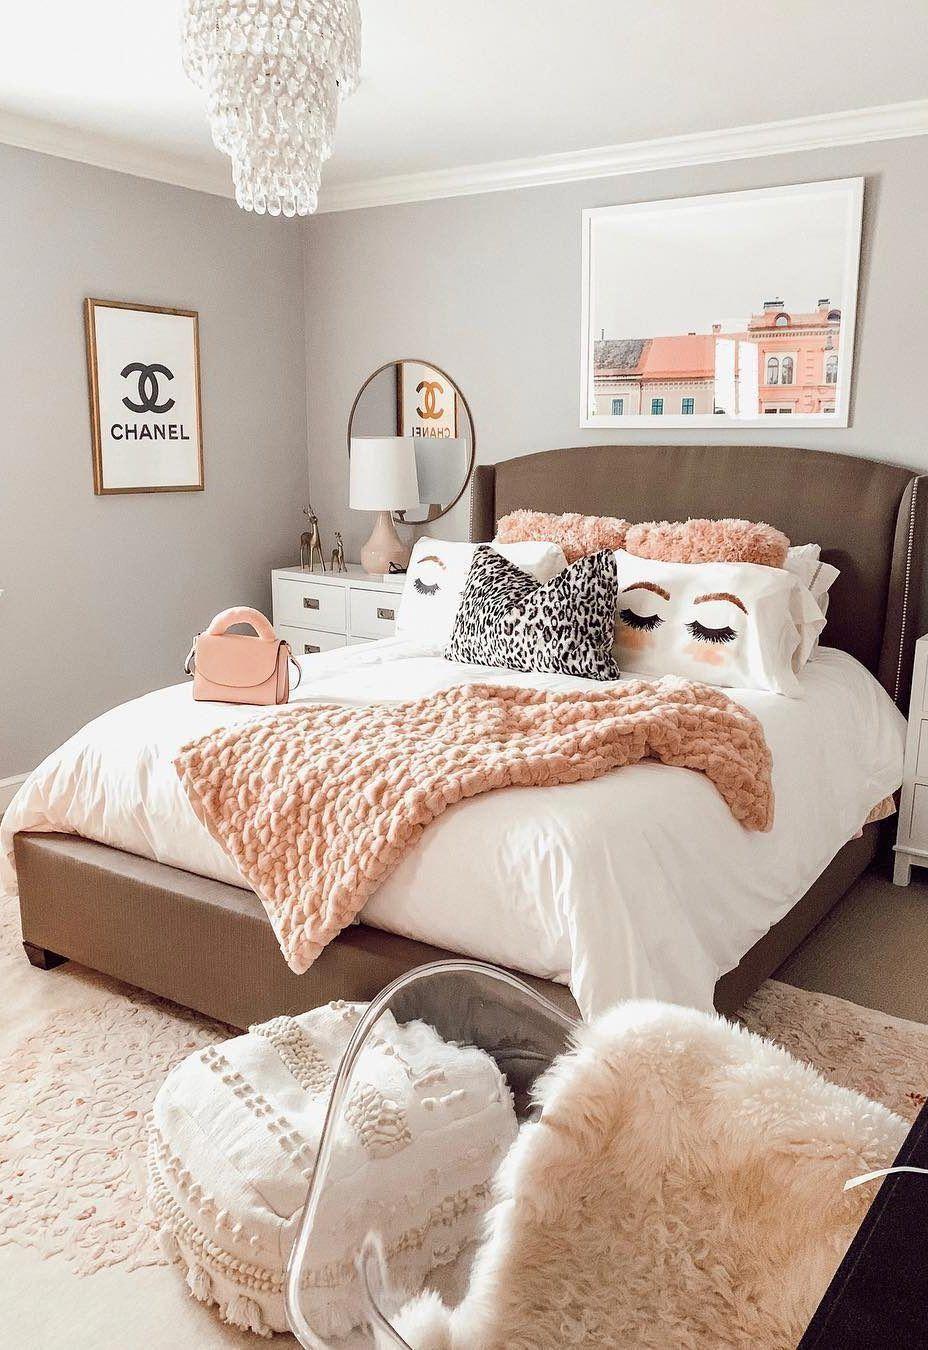 Pin On Bedroom Ideas Fun bedroom decorating ideas